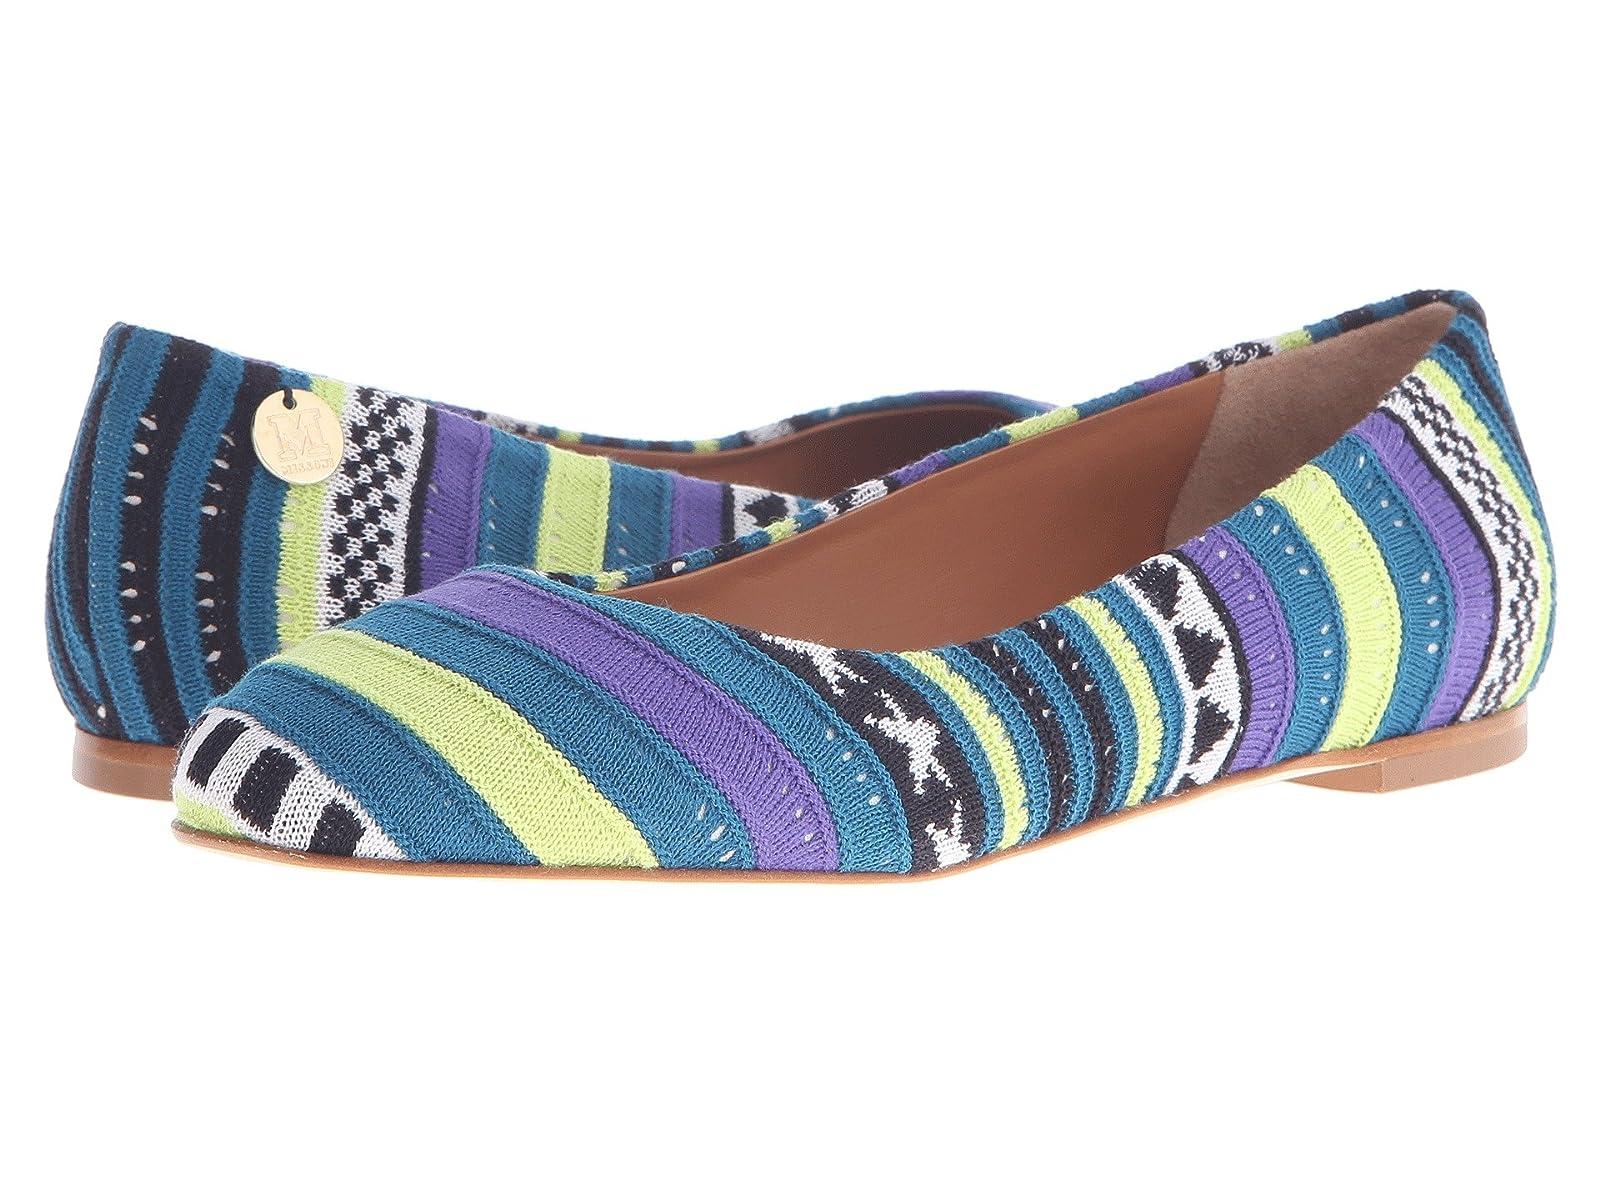 M Missoni Star Stripe Pink Ballet ShoesCheap and distinctive eye-catching shoes